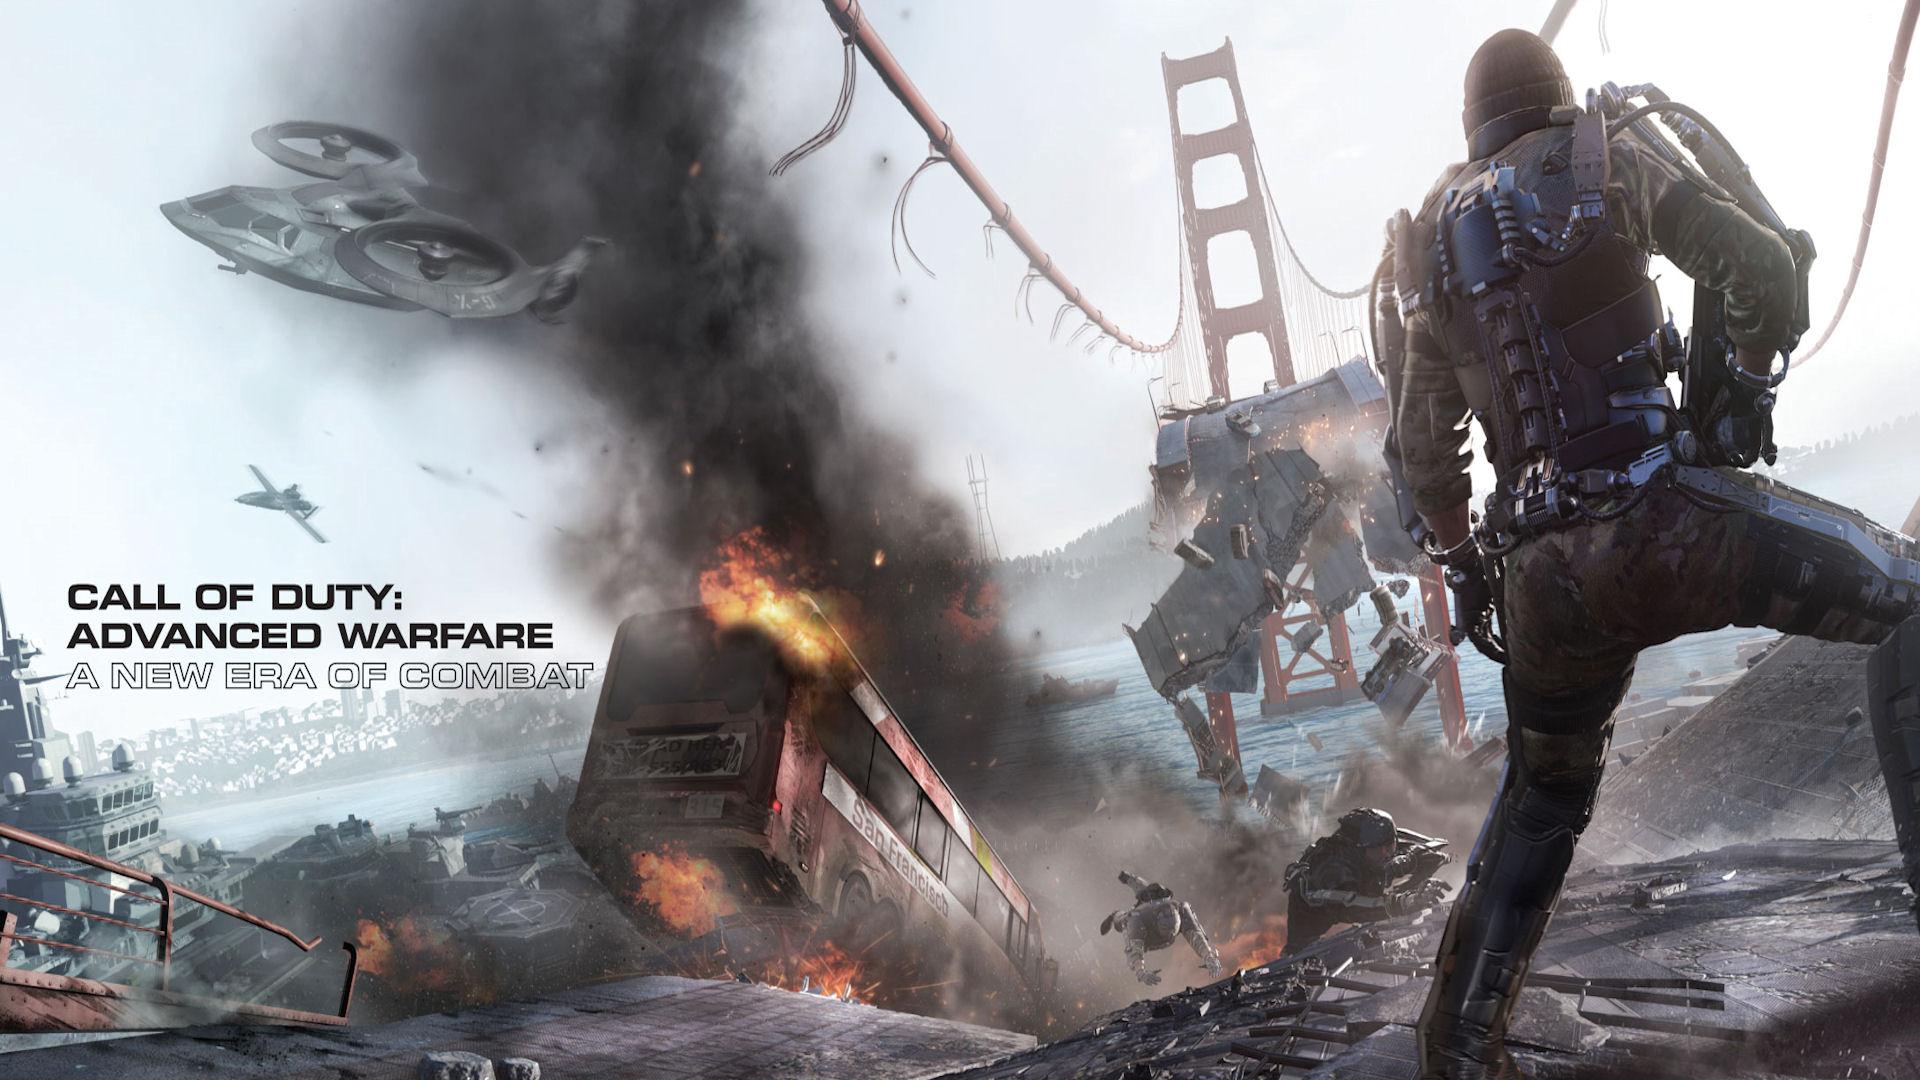 Call Of Duty Advanced Warfare Wallpaper Bridge Image Armies Of